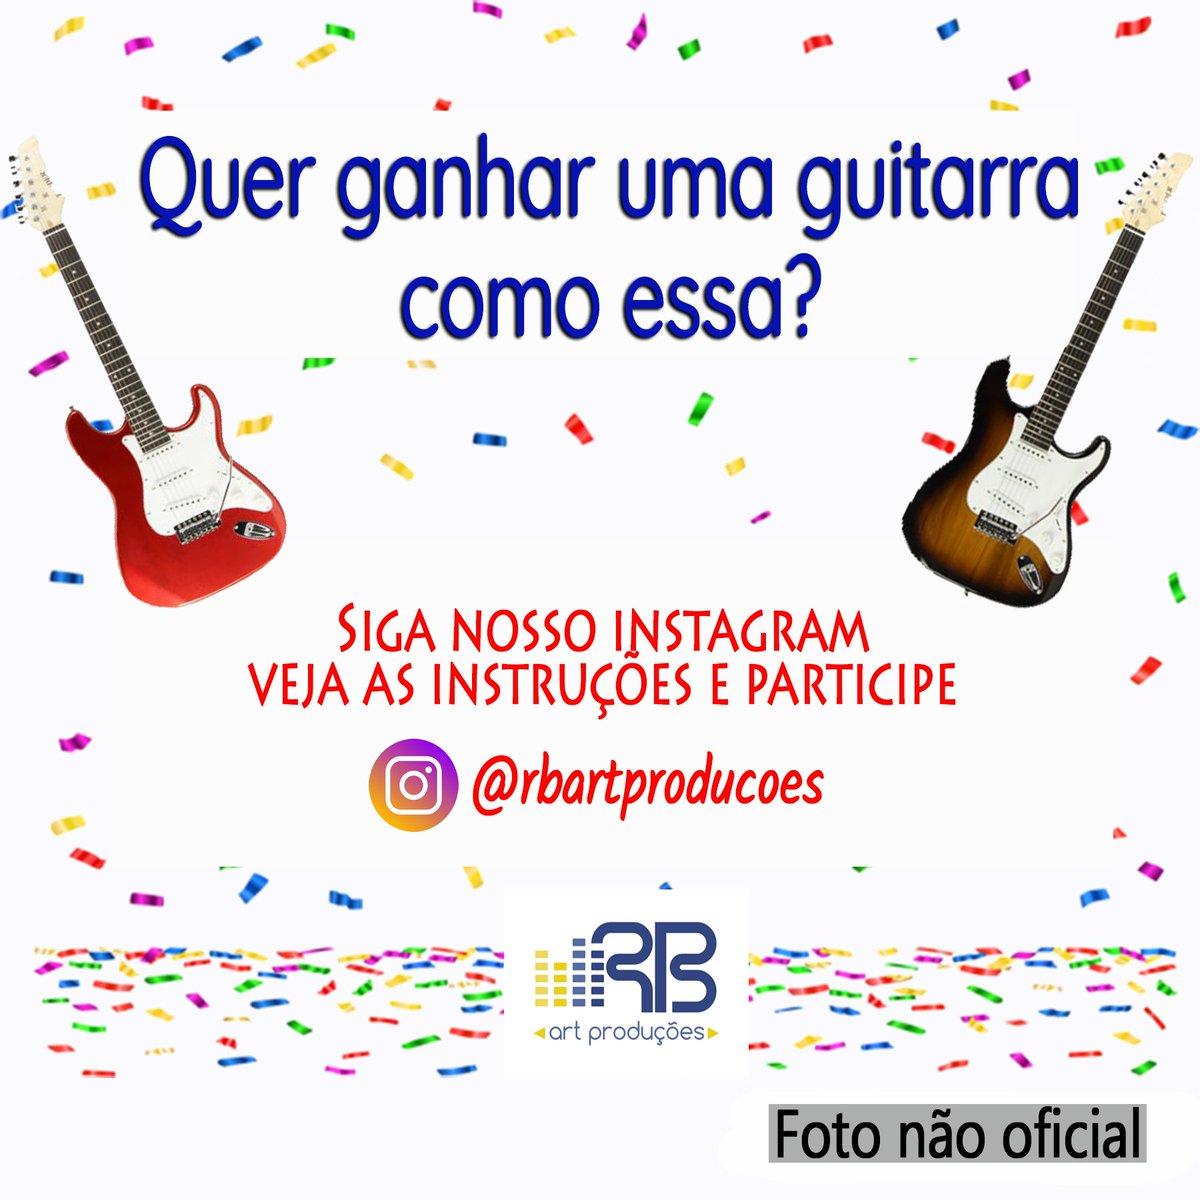 RB Art Produções 🎧's photo on #TBTNoMTVHits